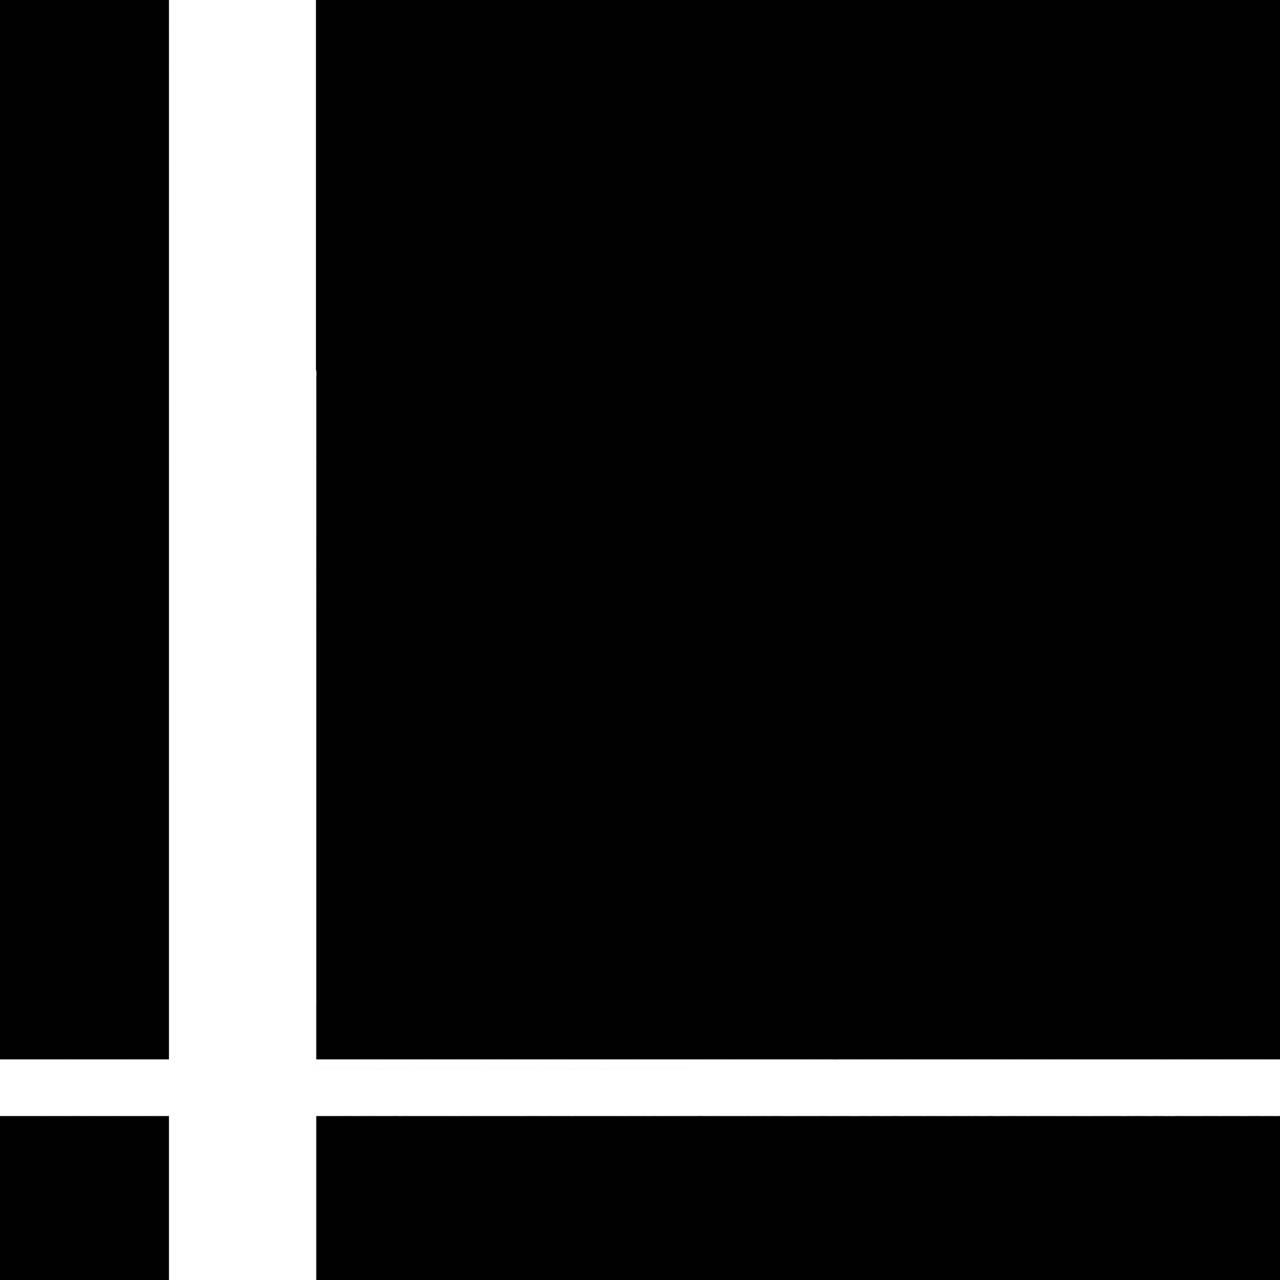 Smash Bros logo